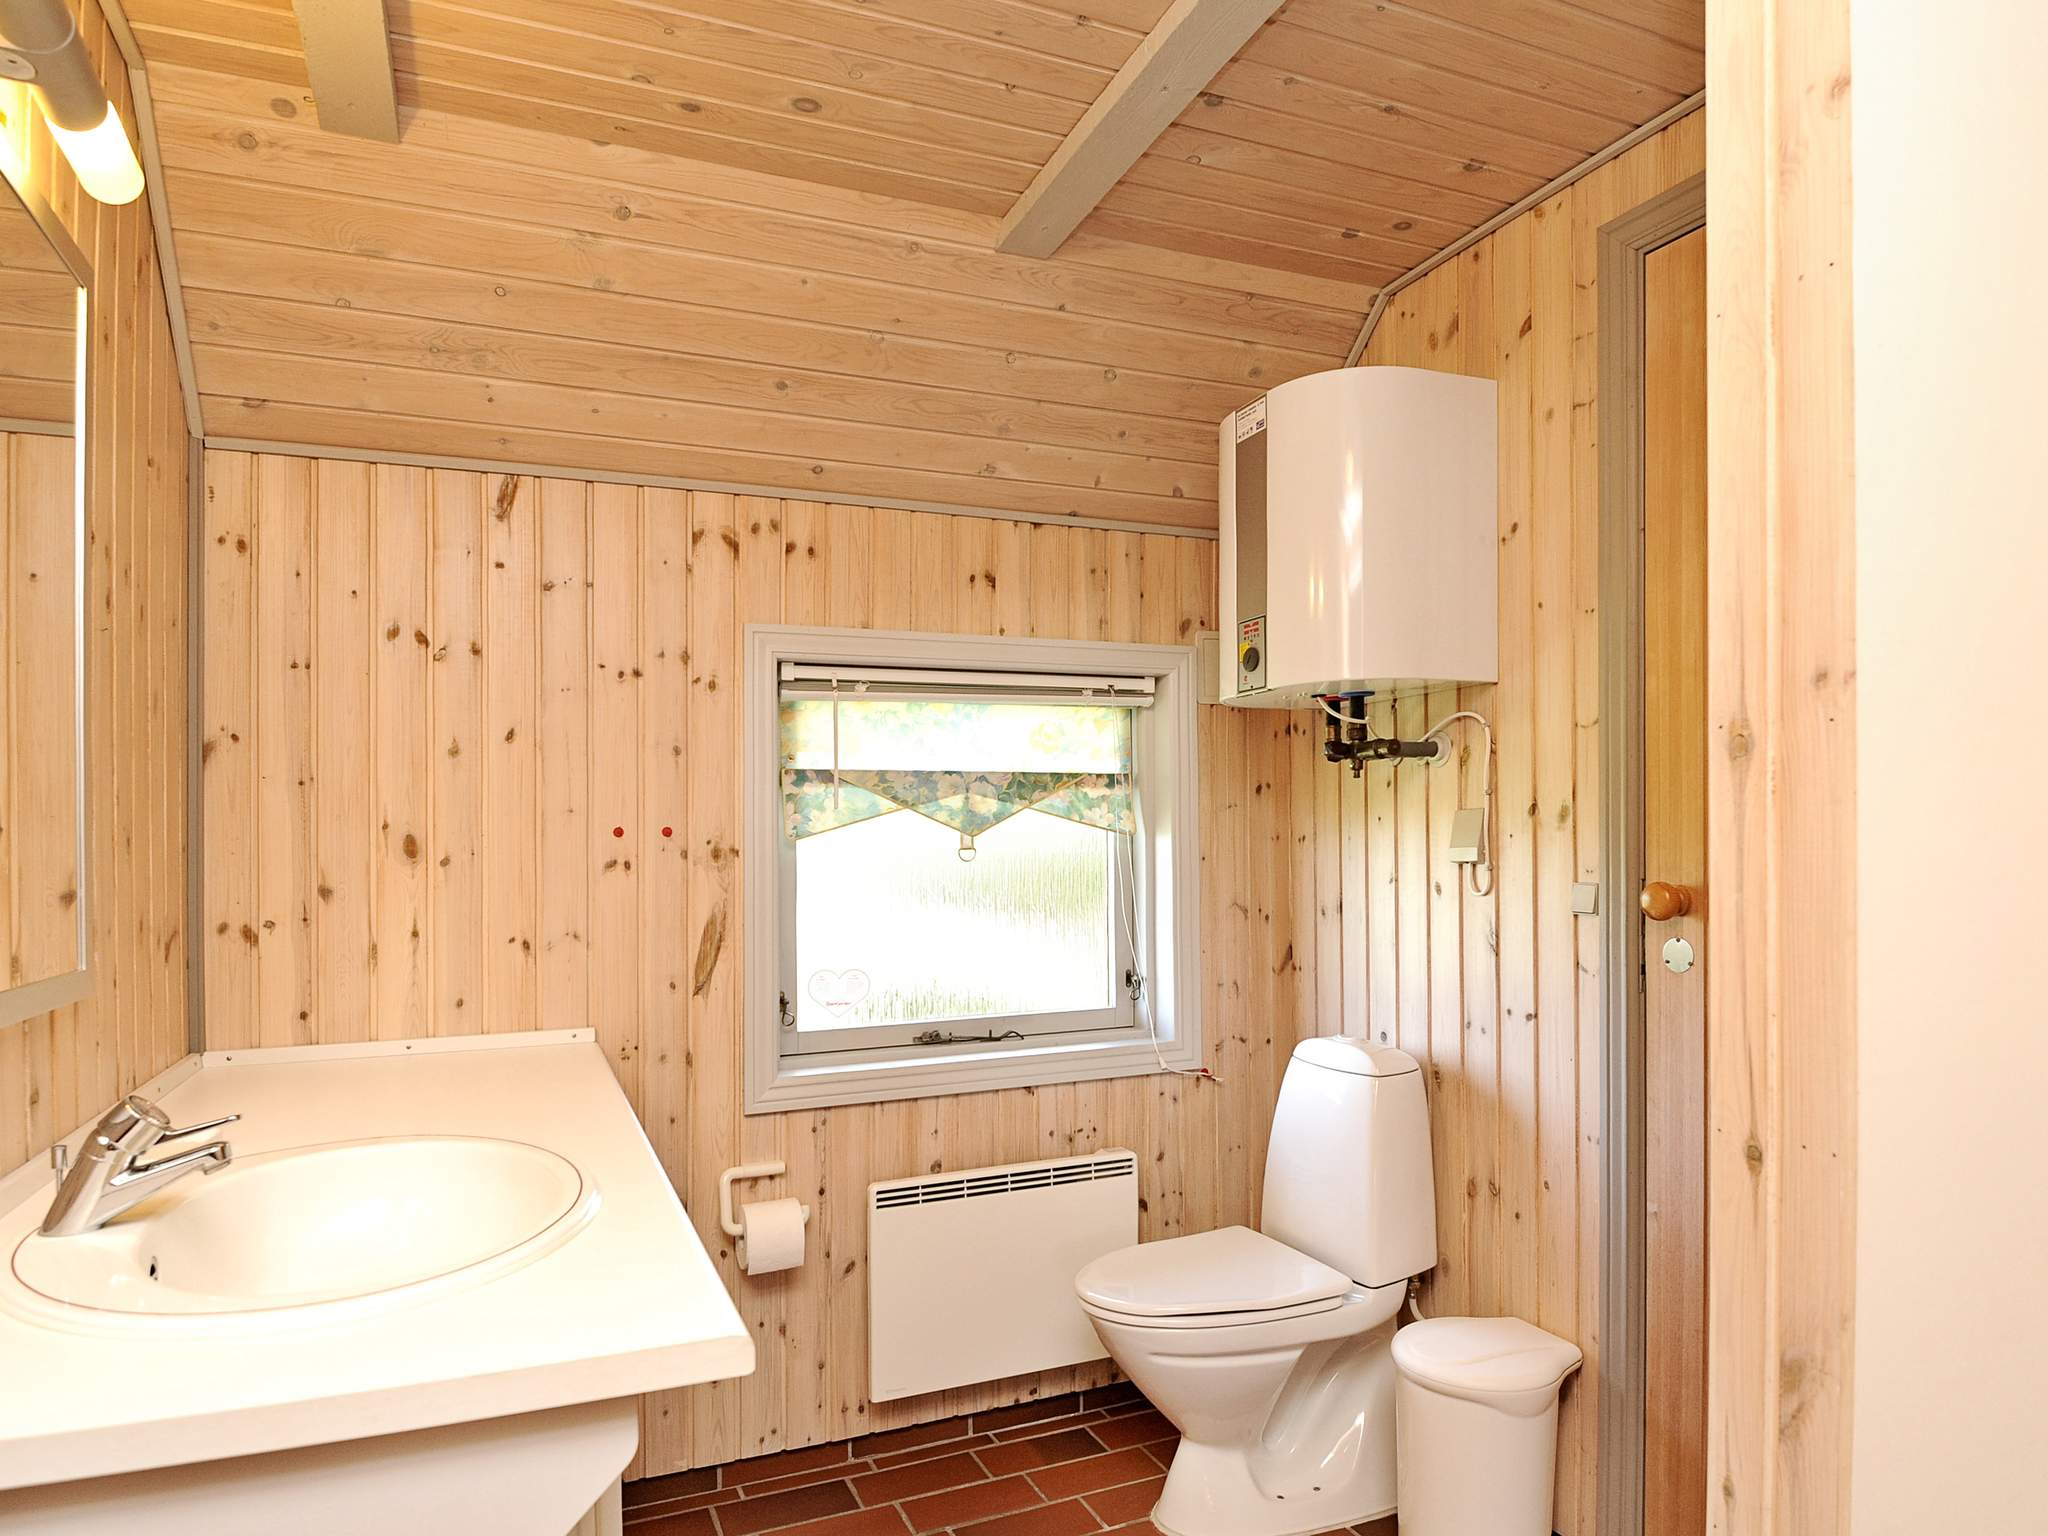 Ferienhaus Blåvand (88476), Blåvand, , Westjütland, Dänemark, Bild 12